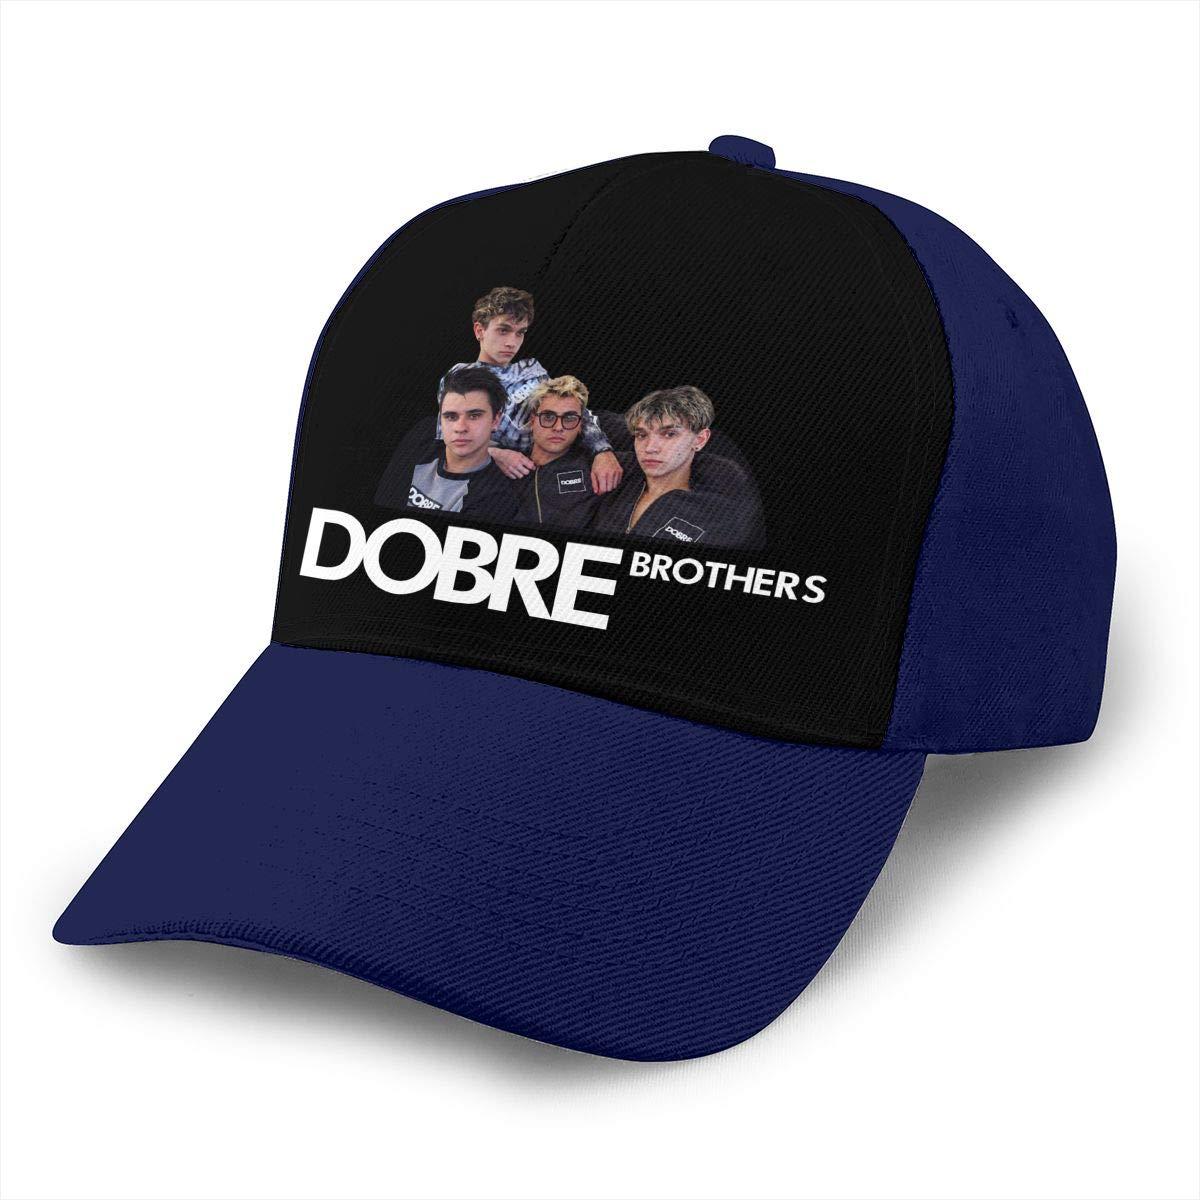 Adjustable Women Men Dobre Brothers Print Baseball Cap Flat Brim Cap Hats Hip Hop Snapback Sun Hat Boys Girls Navy by Apolonia